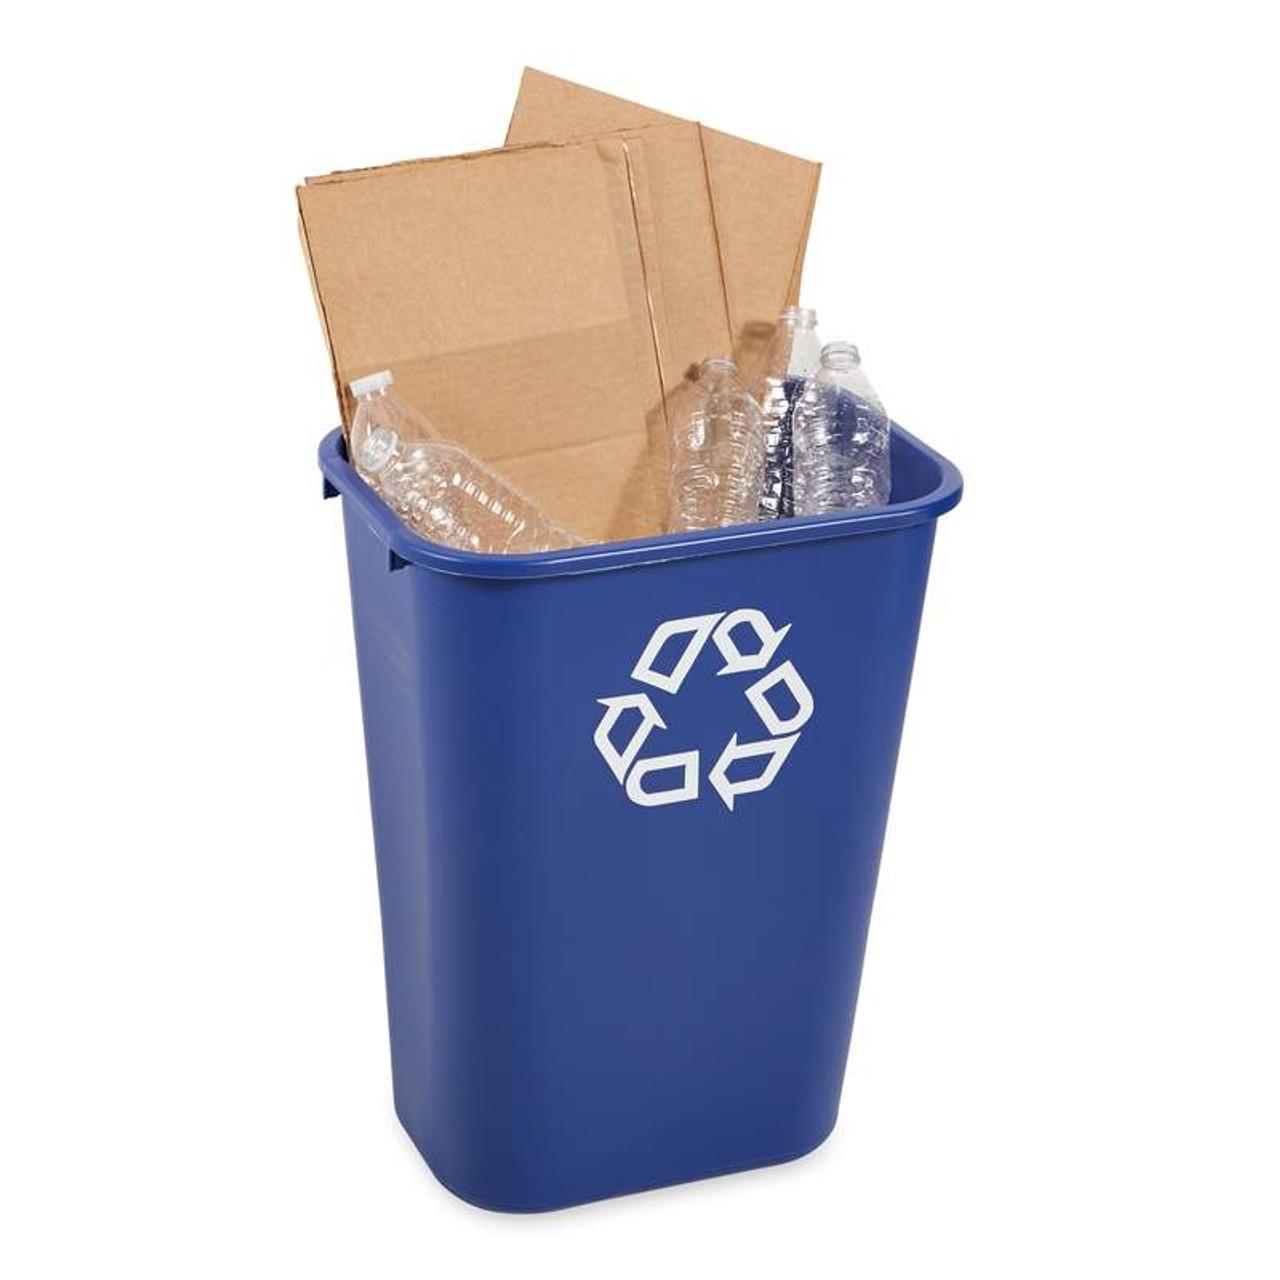 Rubbermaid Rectangular Wastebasket 39 L - Blue - FG295773BLUE